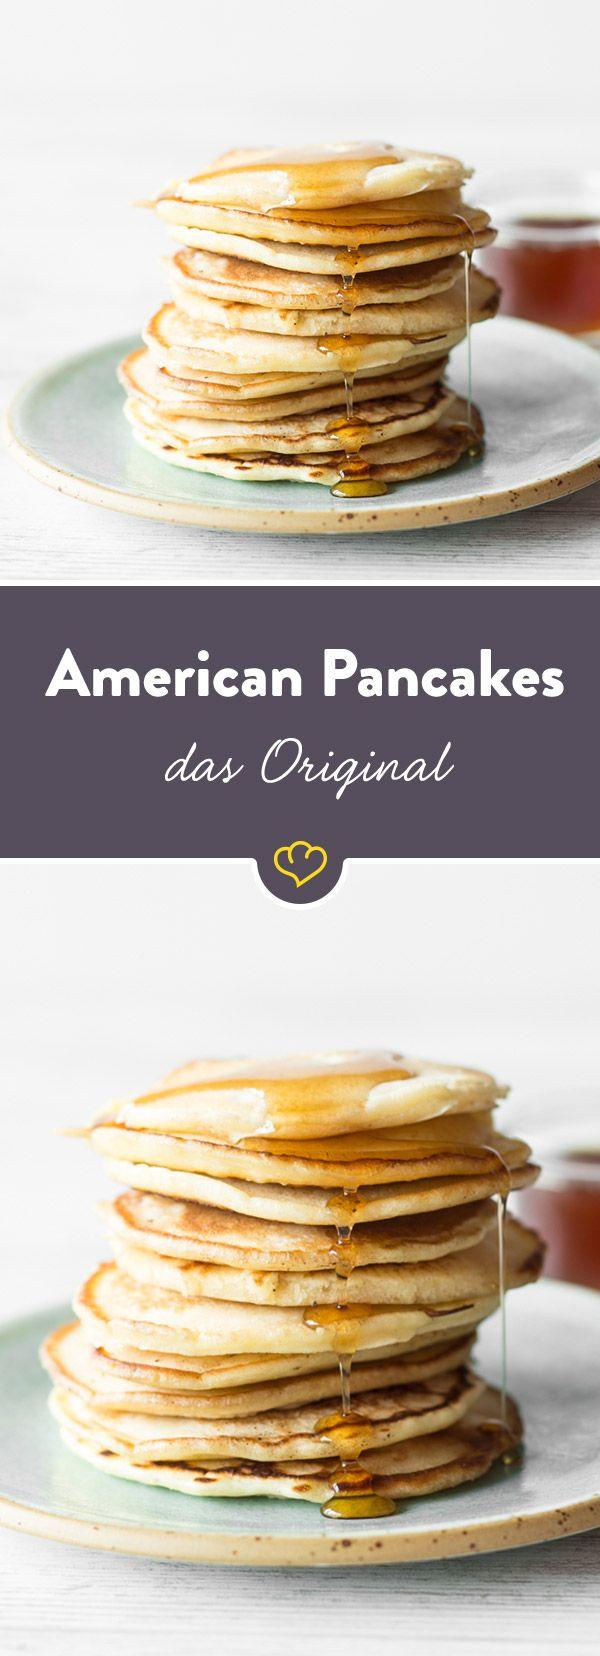 Photo of American Pancakes